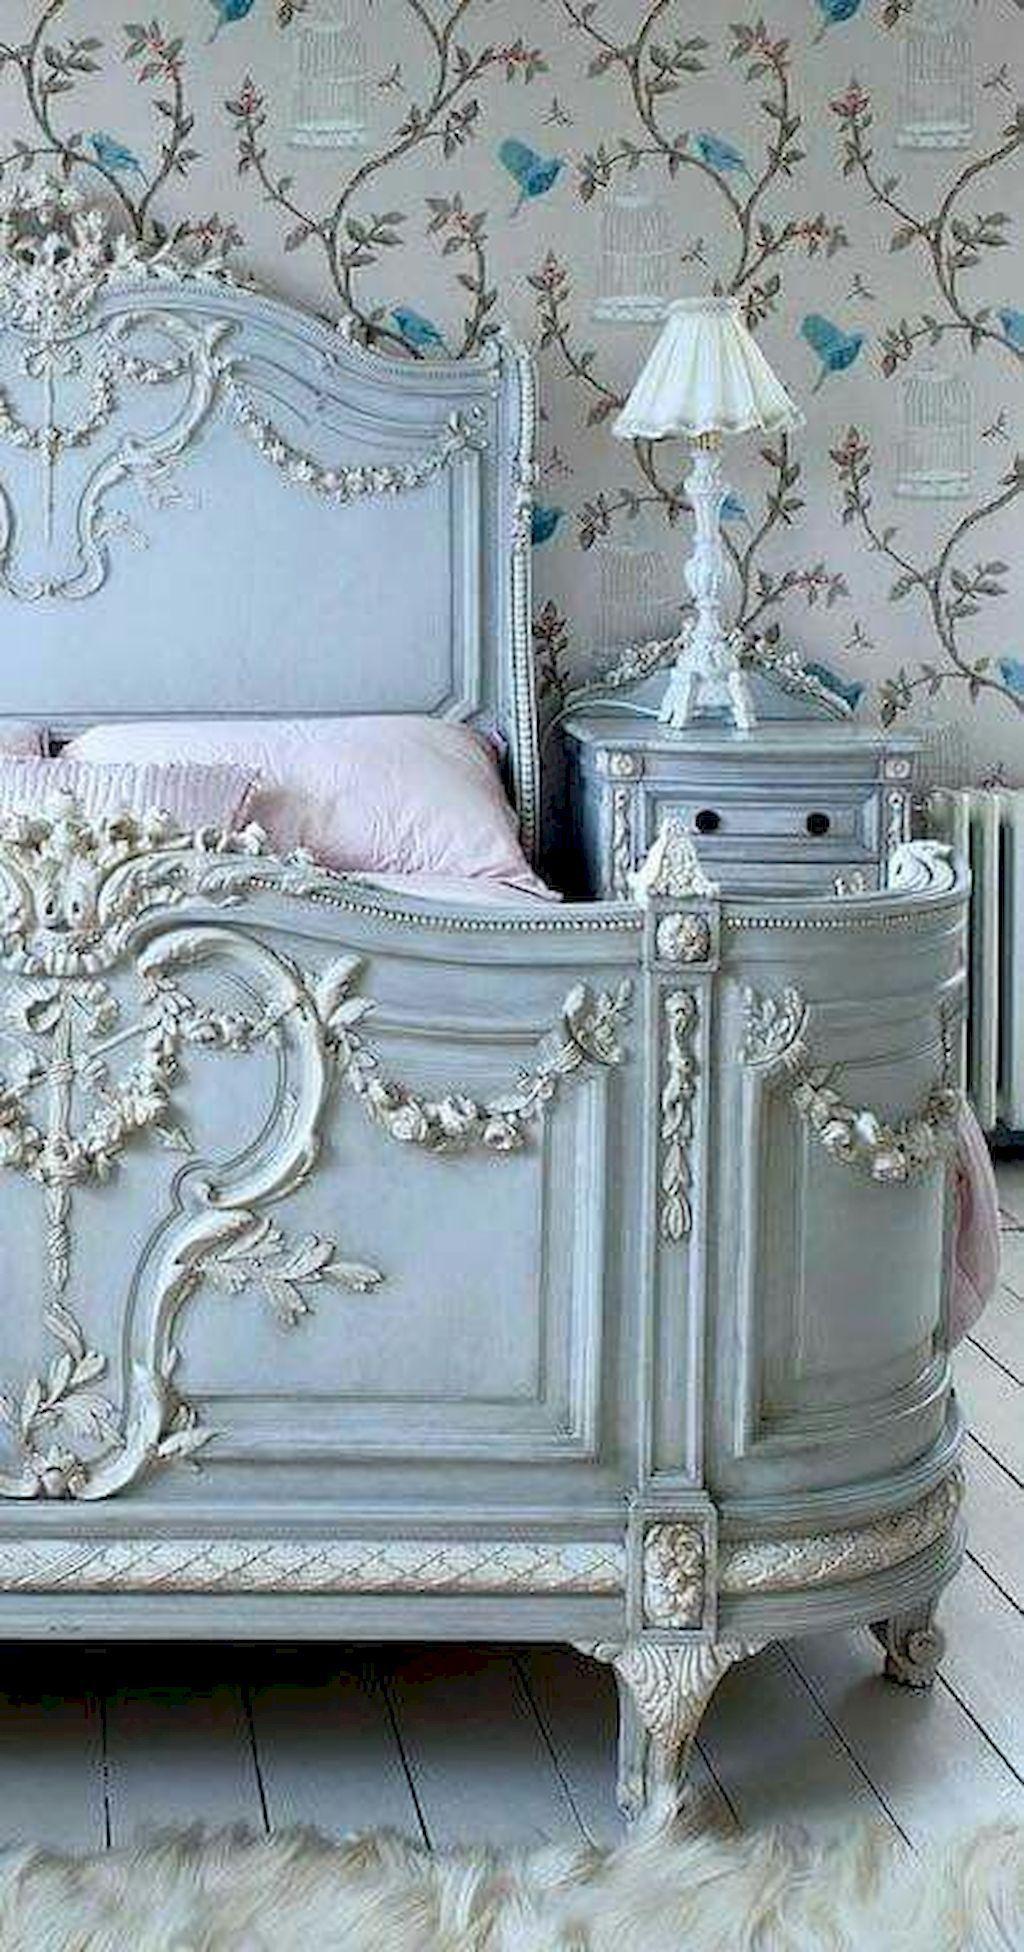 Romantic shabby chic bedroom decorating ideas 2 romanticbedroomslighting